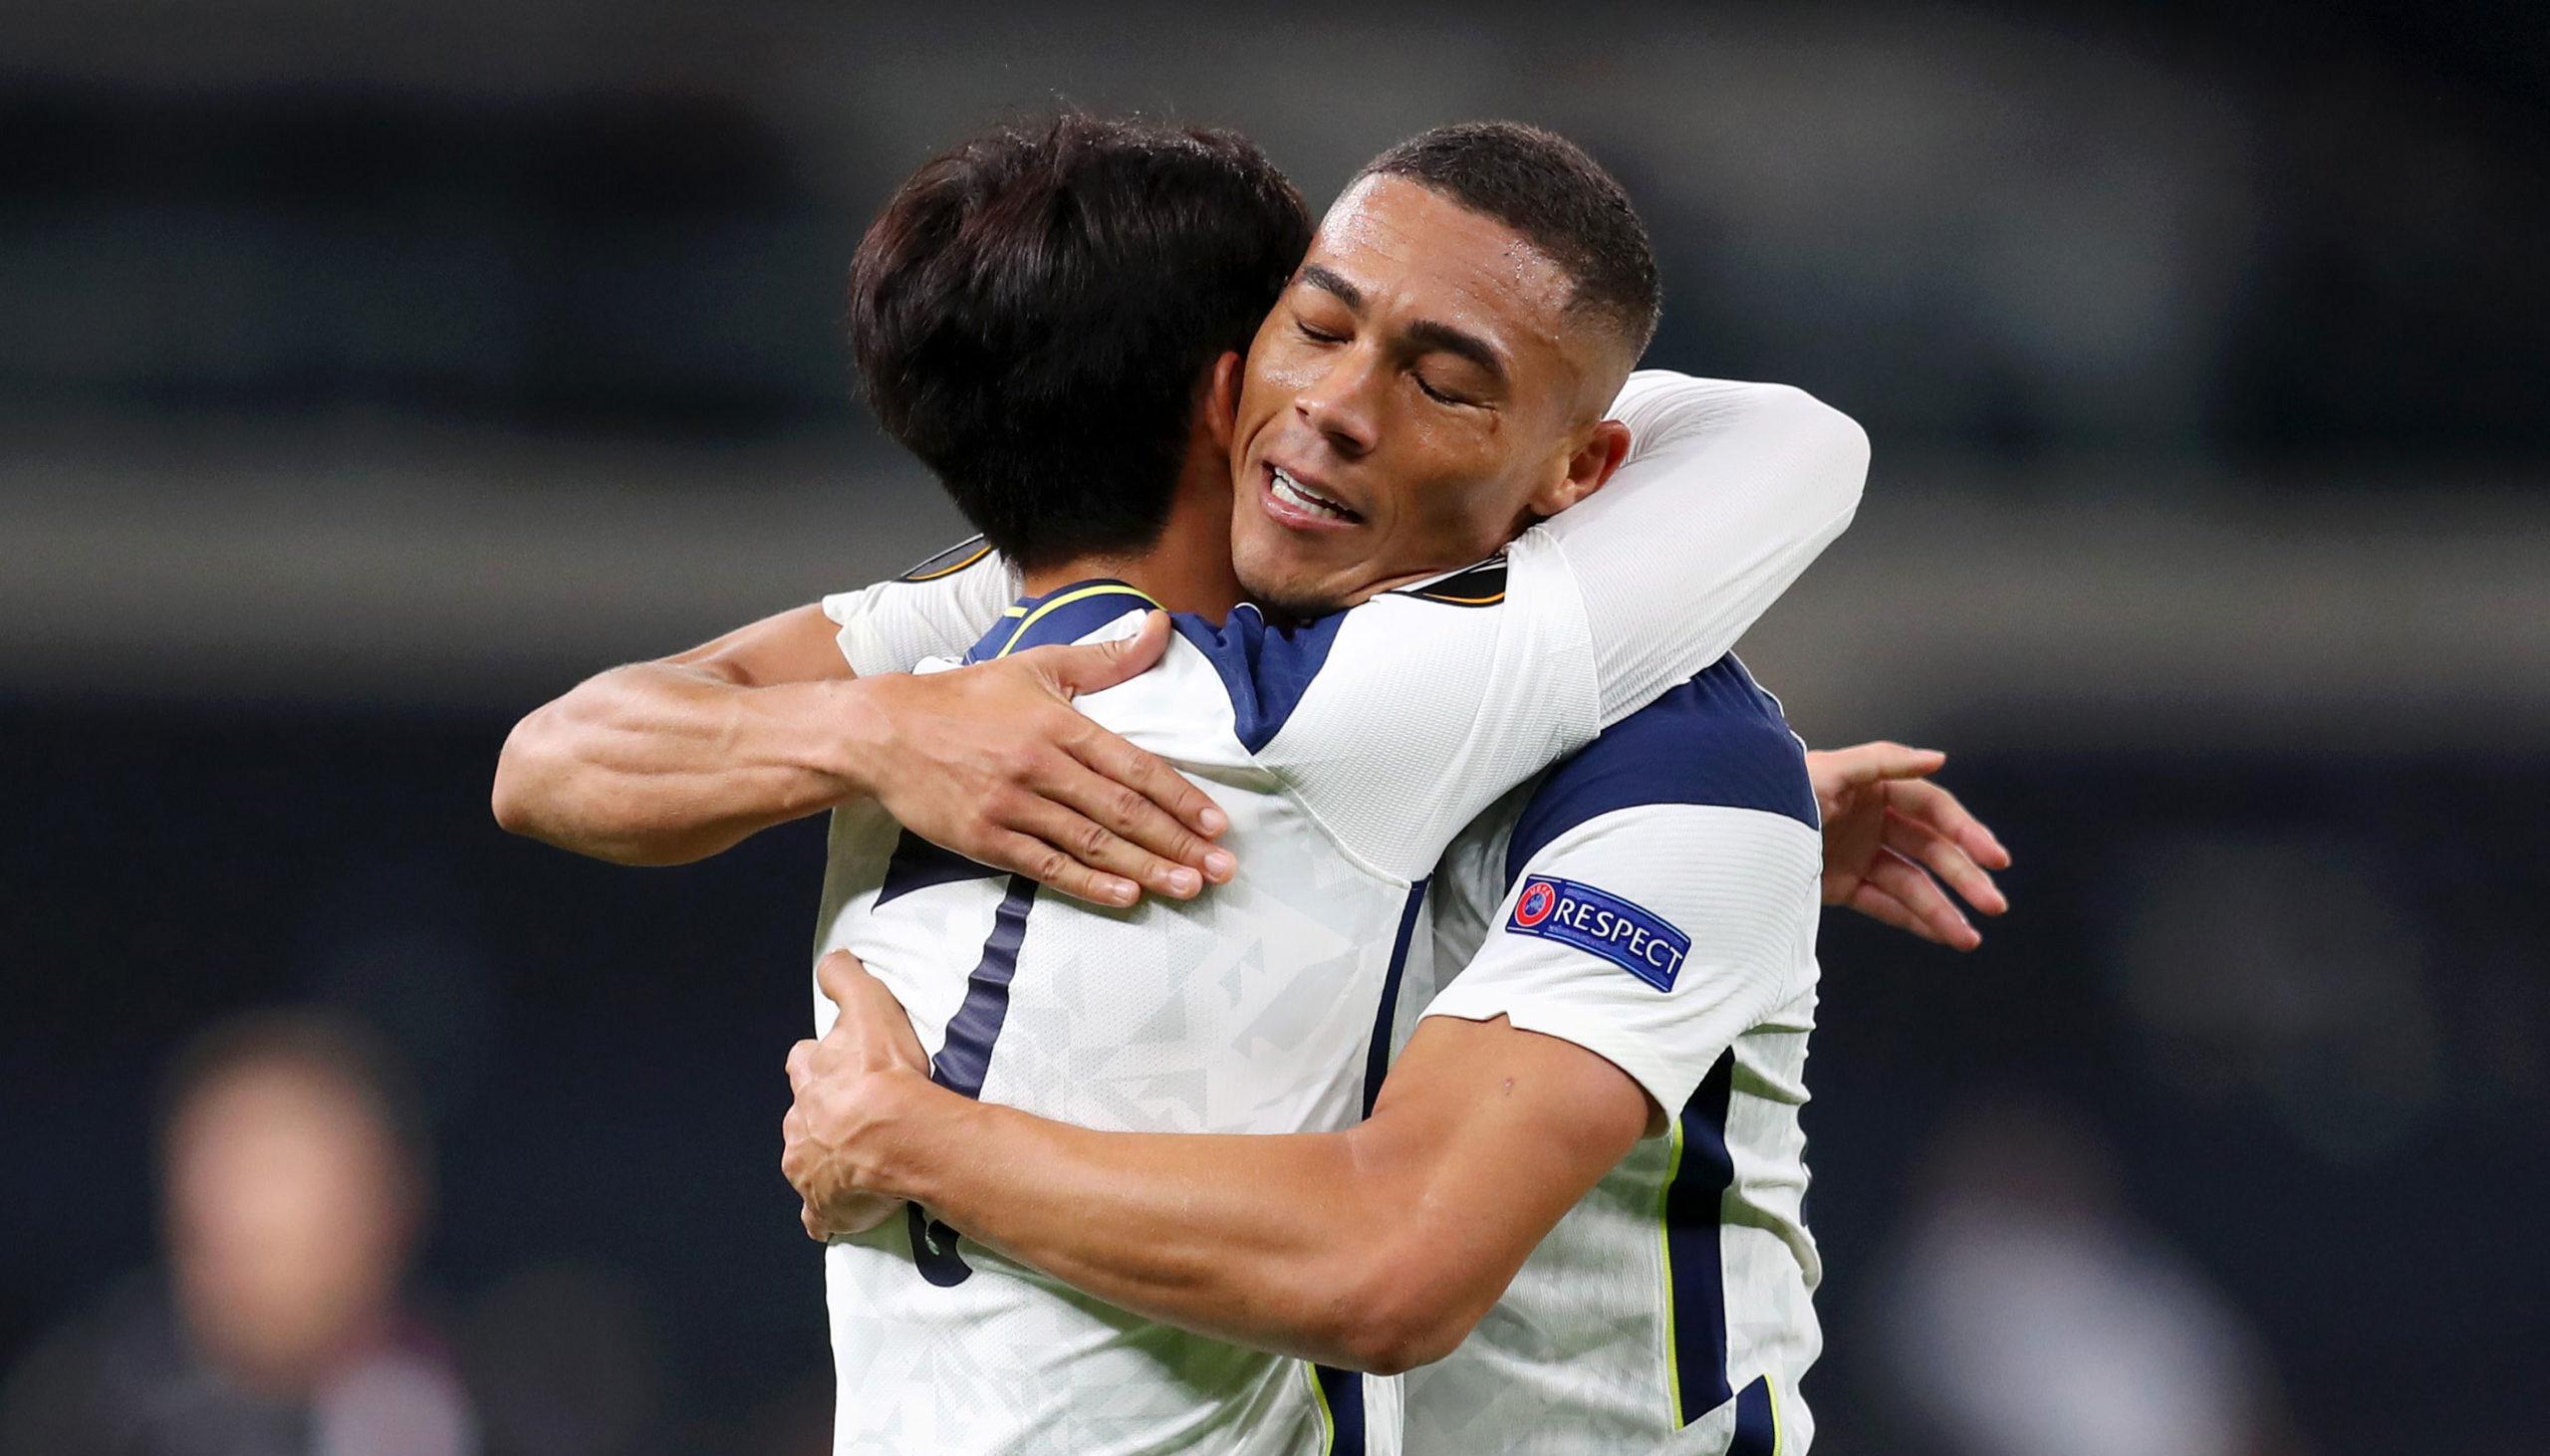 Tottenham vs Brighton: Son to shine again as goals flow